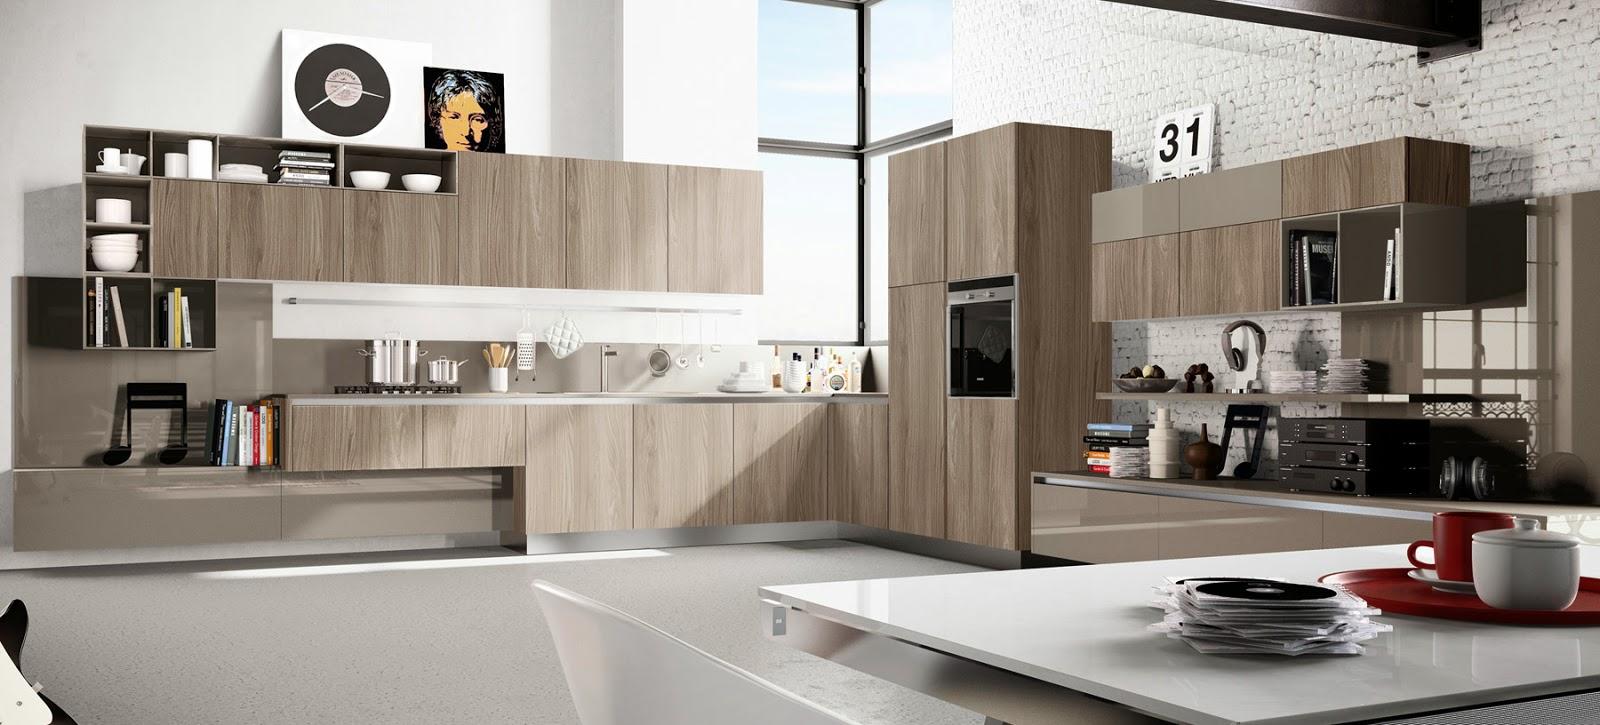 Cucina Moderna Ad Angolo : Cucina moderna ad angolo. Cucine ...